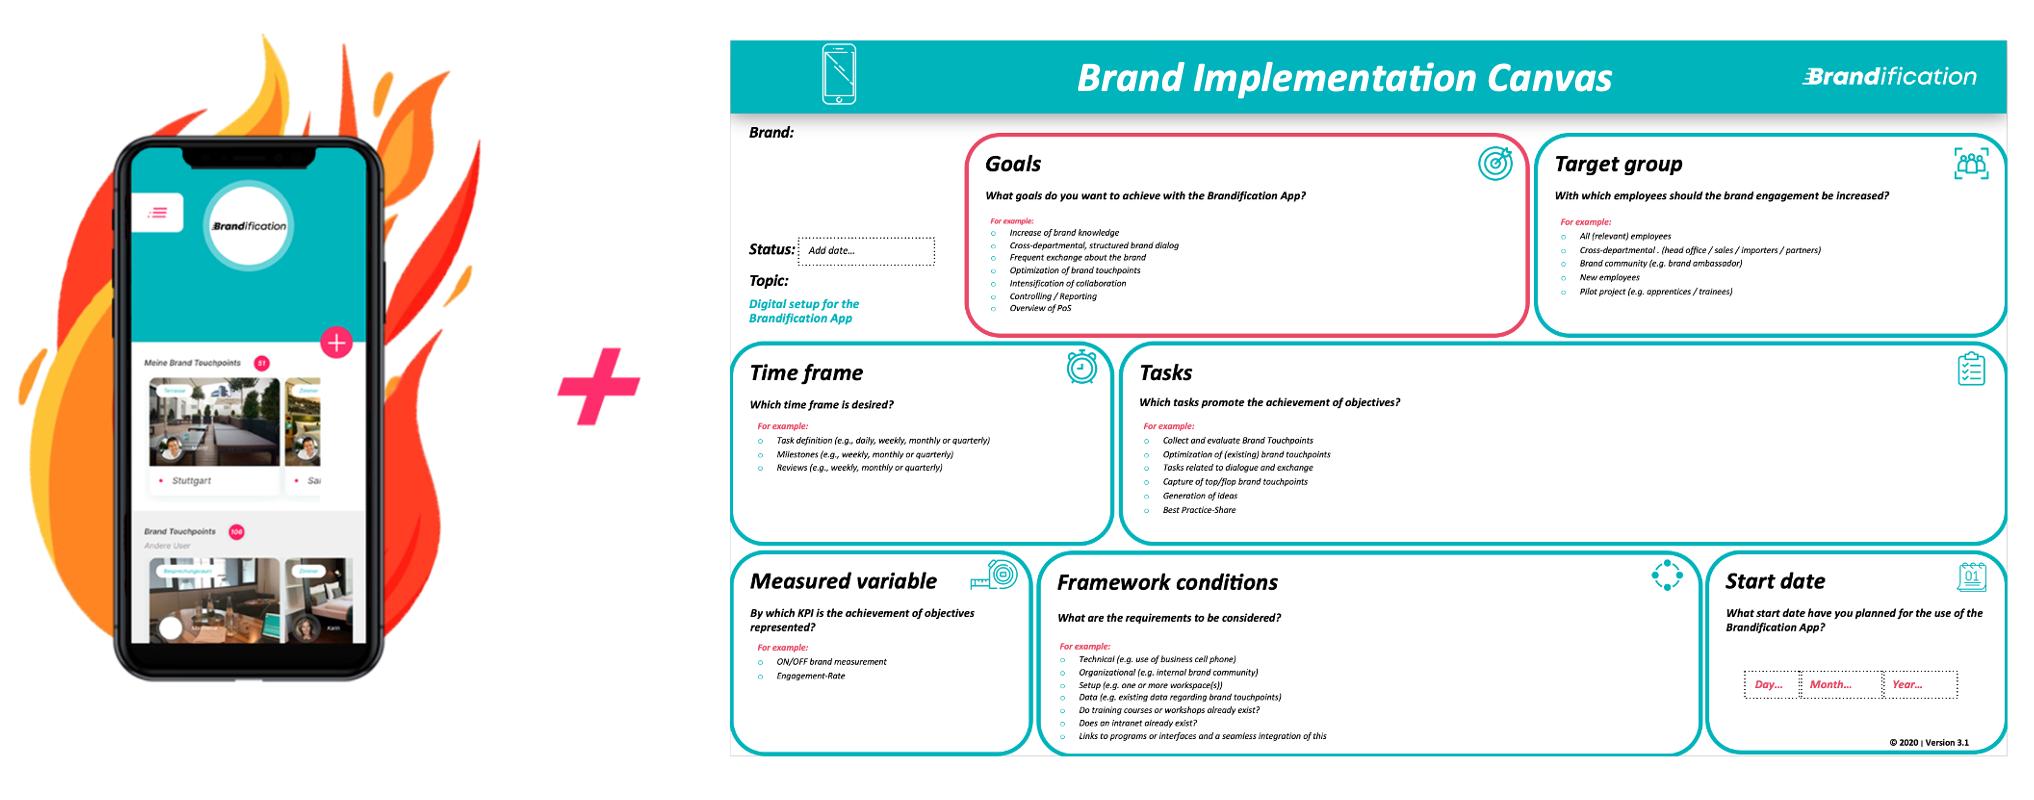 Brandification brand implementation canvas